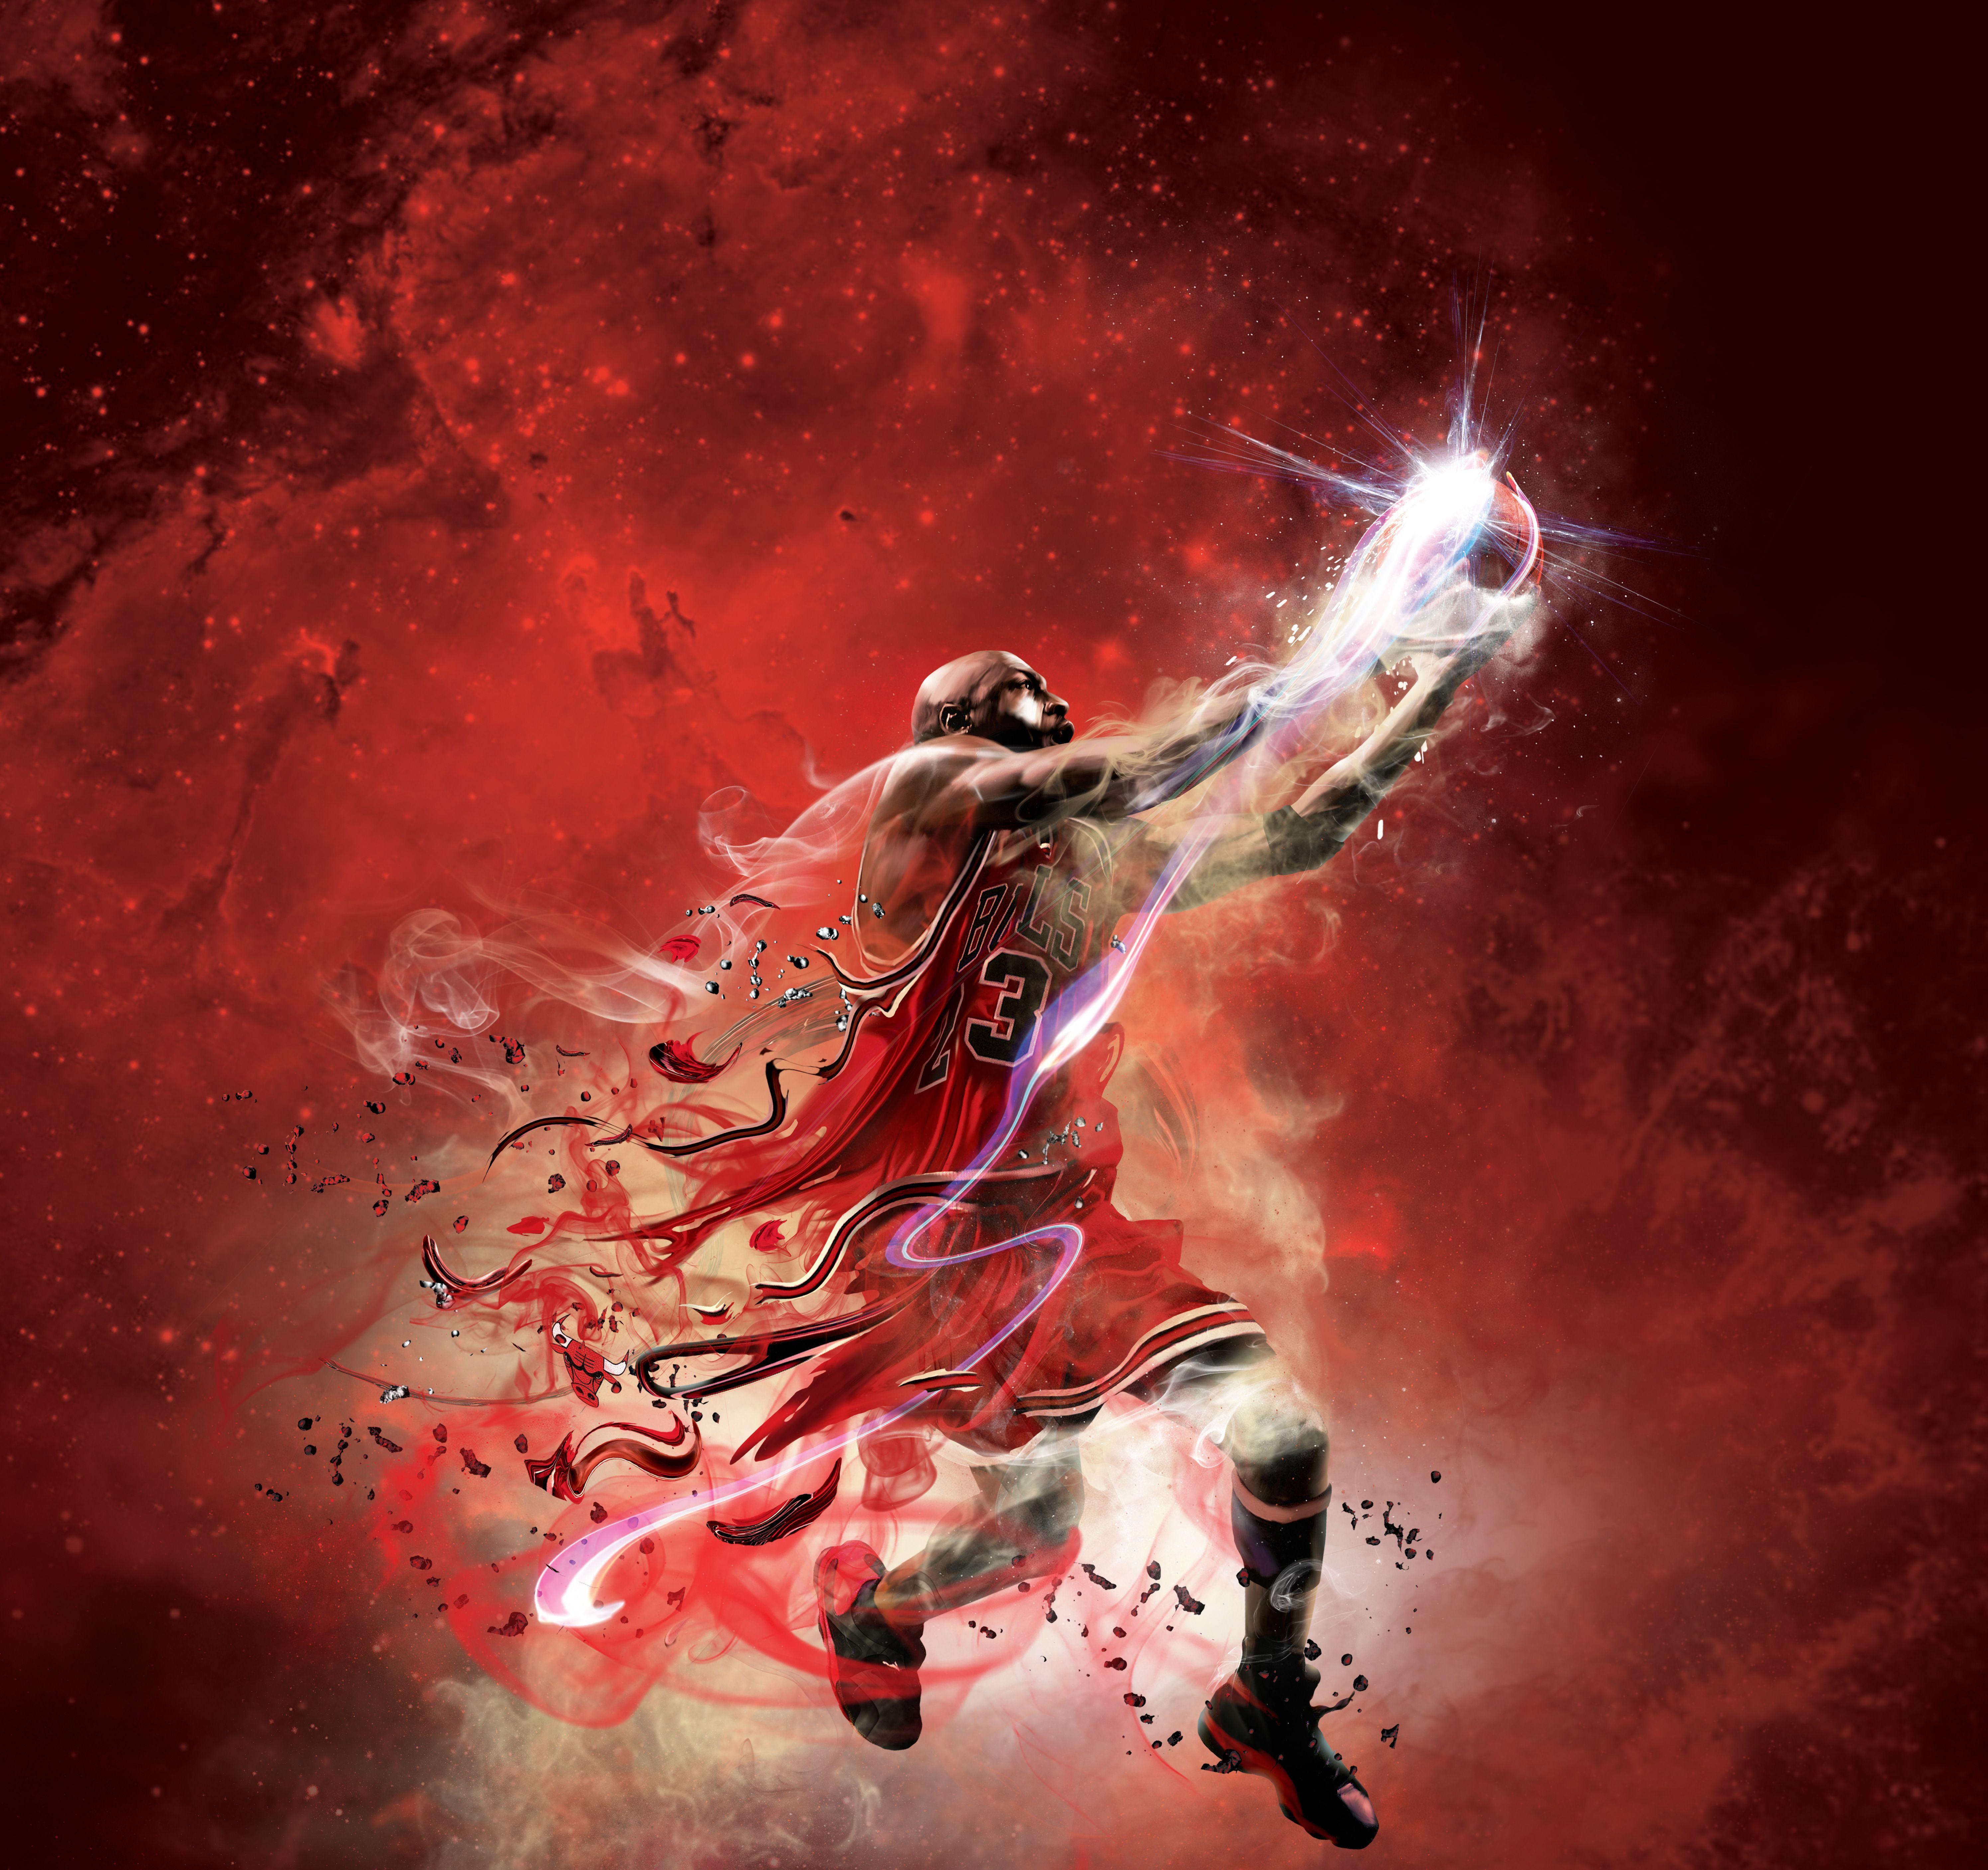 4k Nba Wallpapers Top Free 4k Nba Backgrounds Wallpaperaccess Nba Wallpapers Basketball Wallpaper Michael Jordan